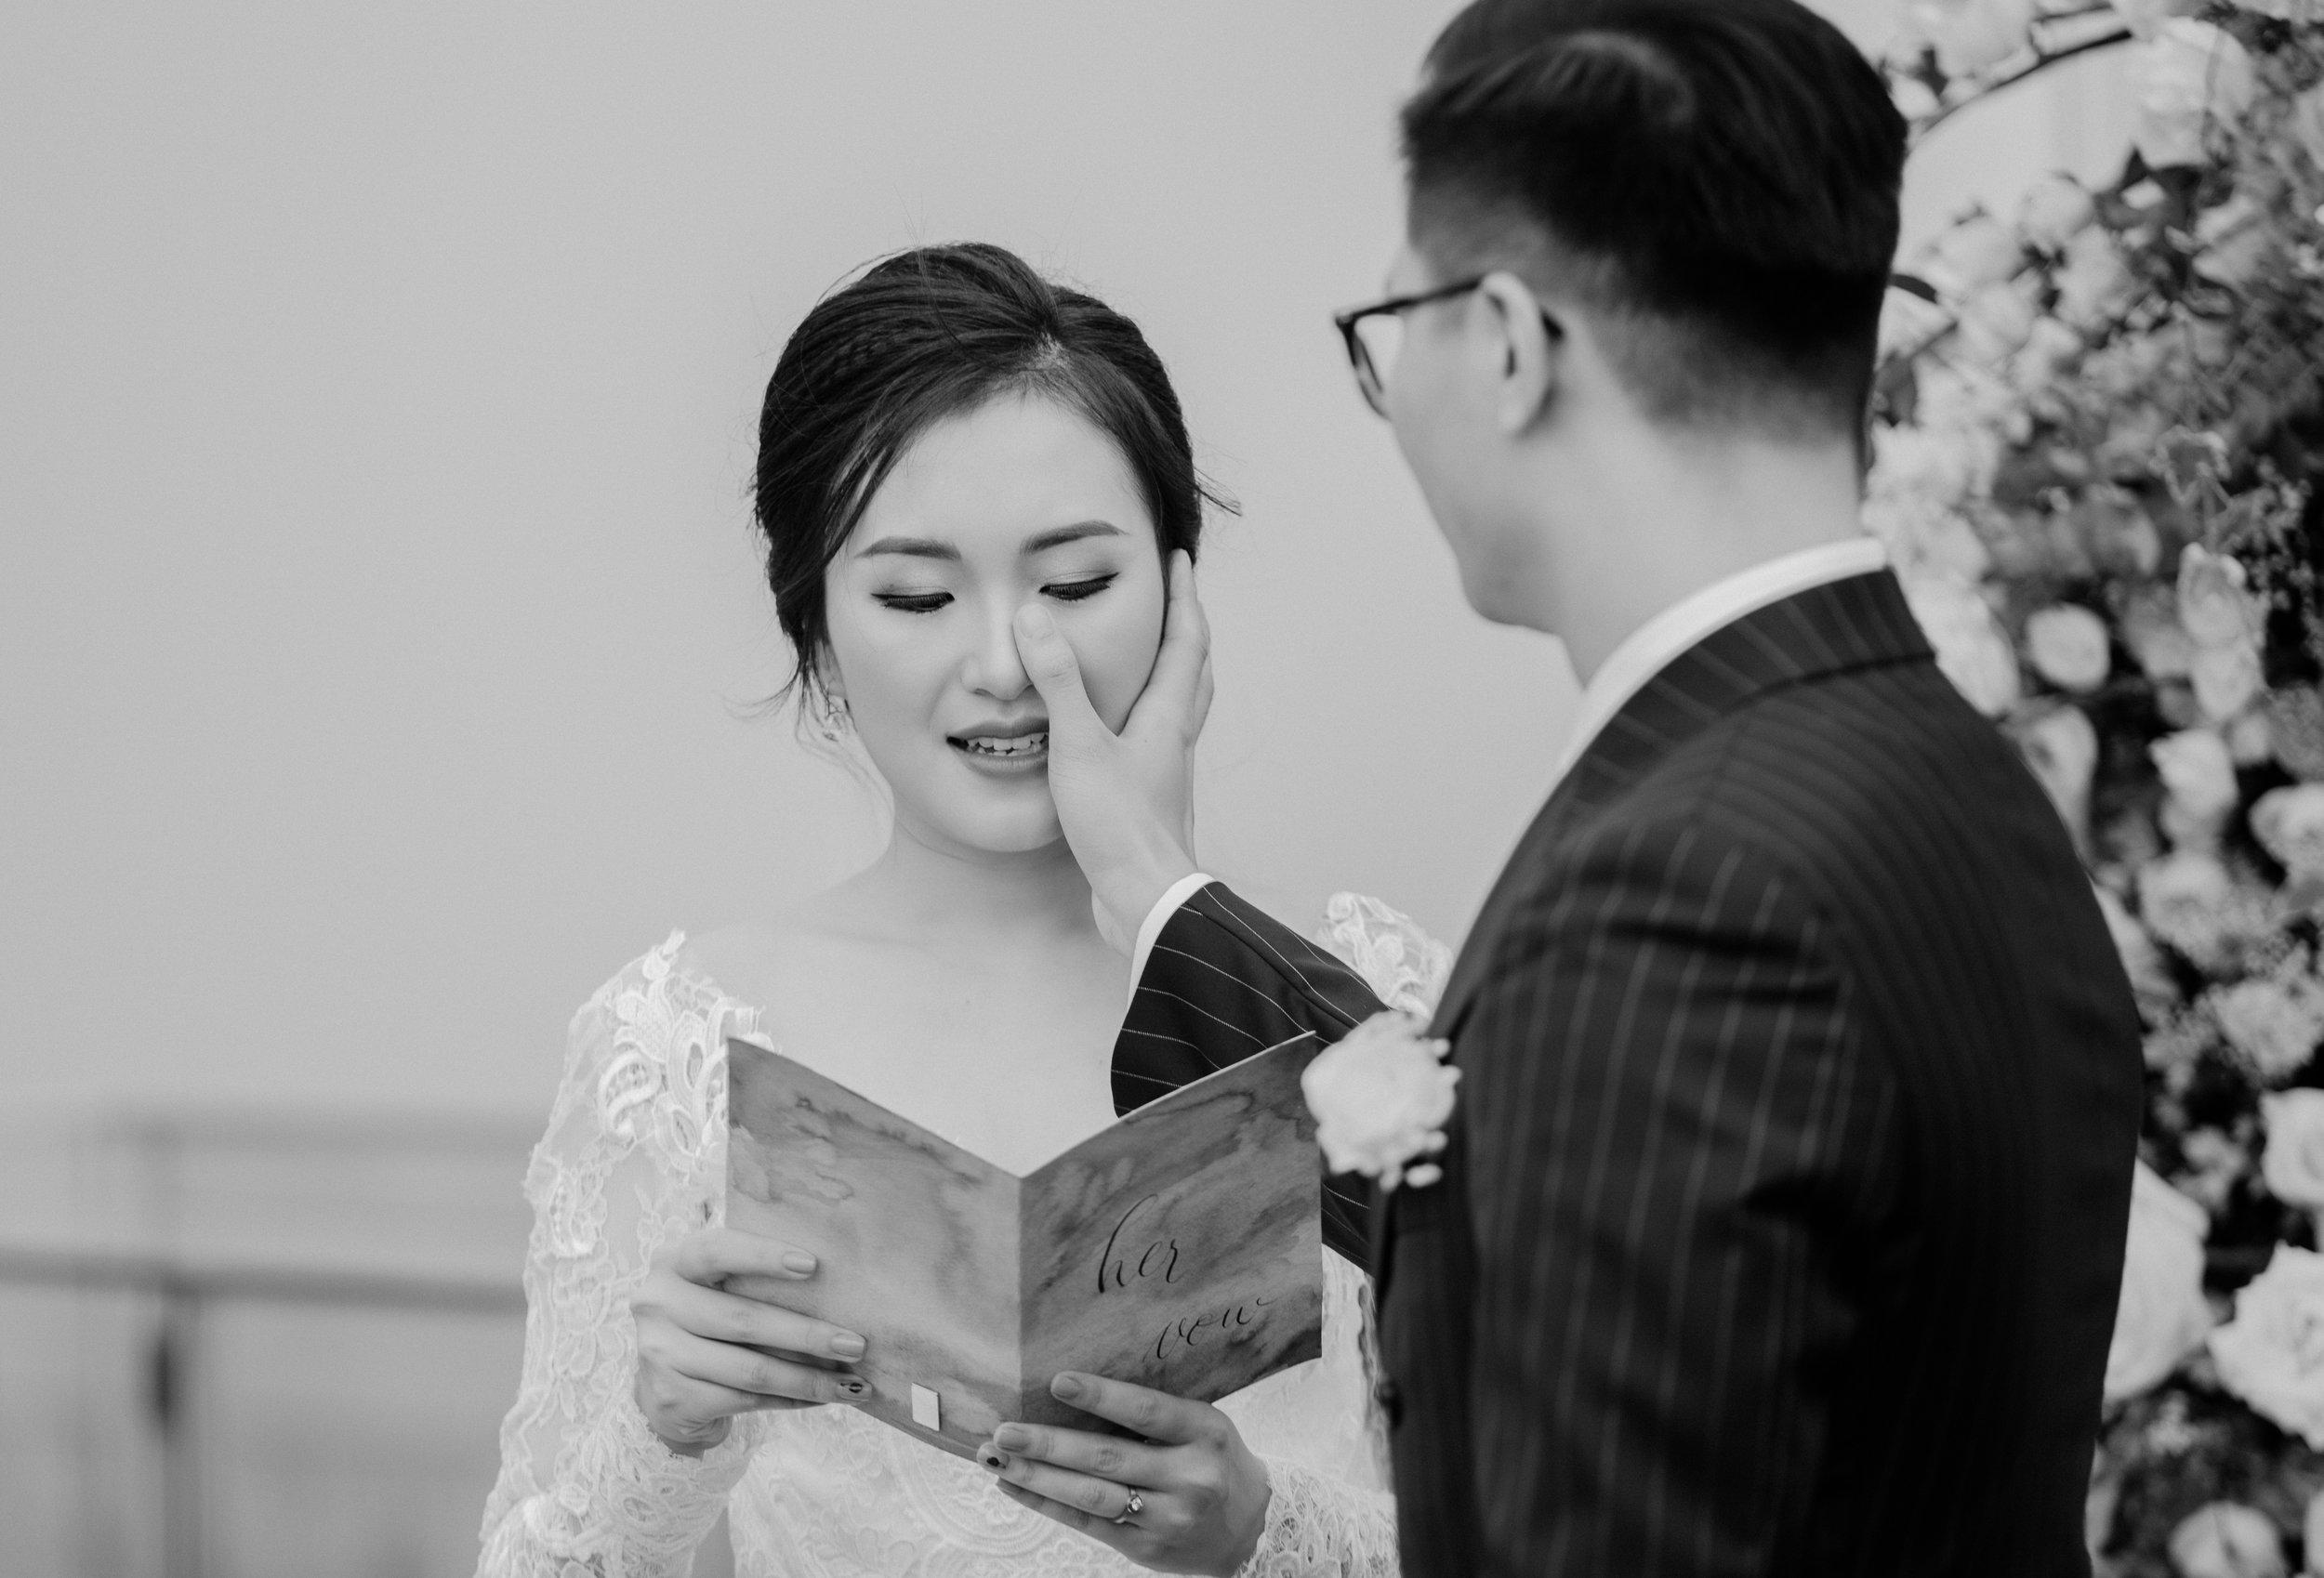 Mirrorwedding Destination Photographer TopofHanoi Duc Anh Hien Trang 164921.jpg